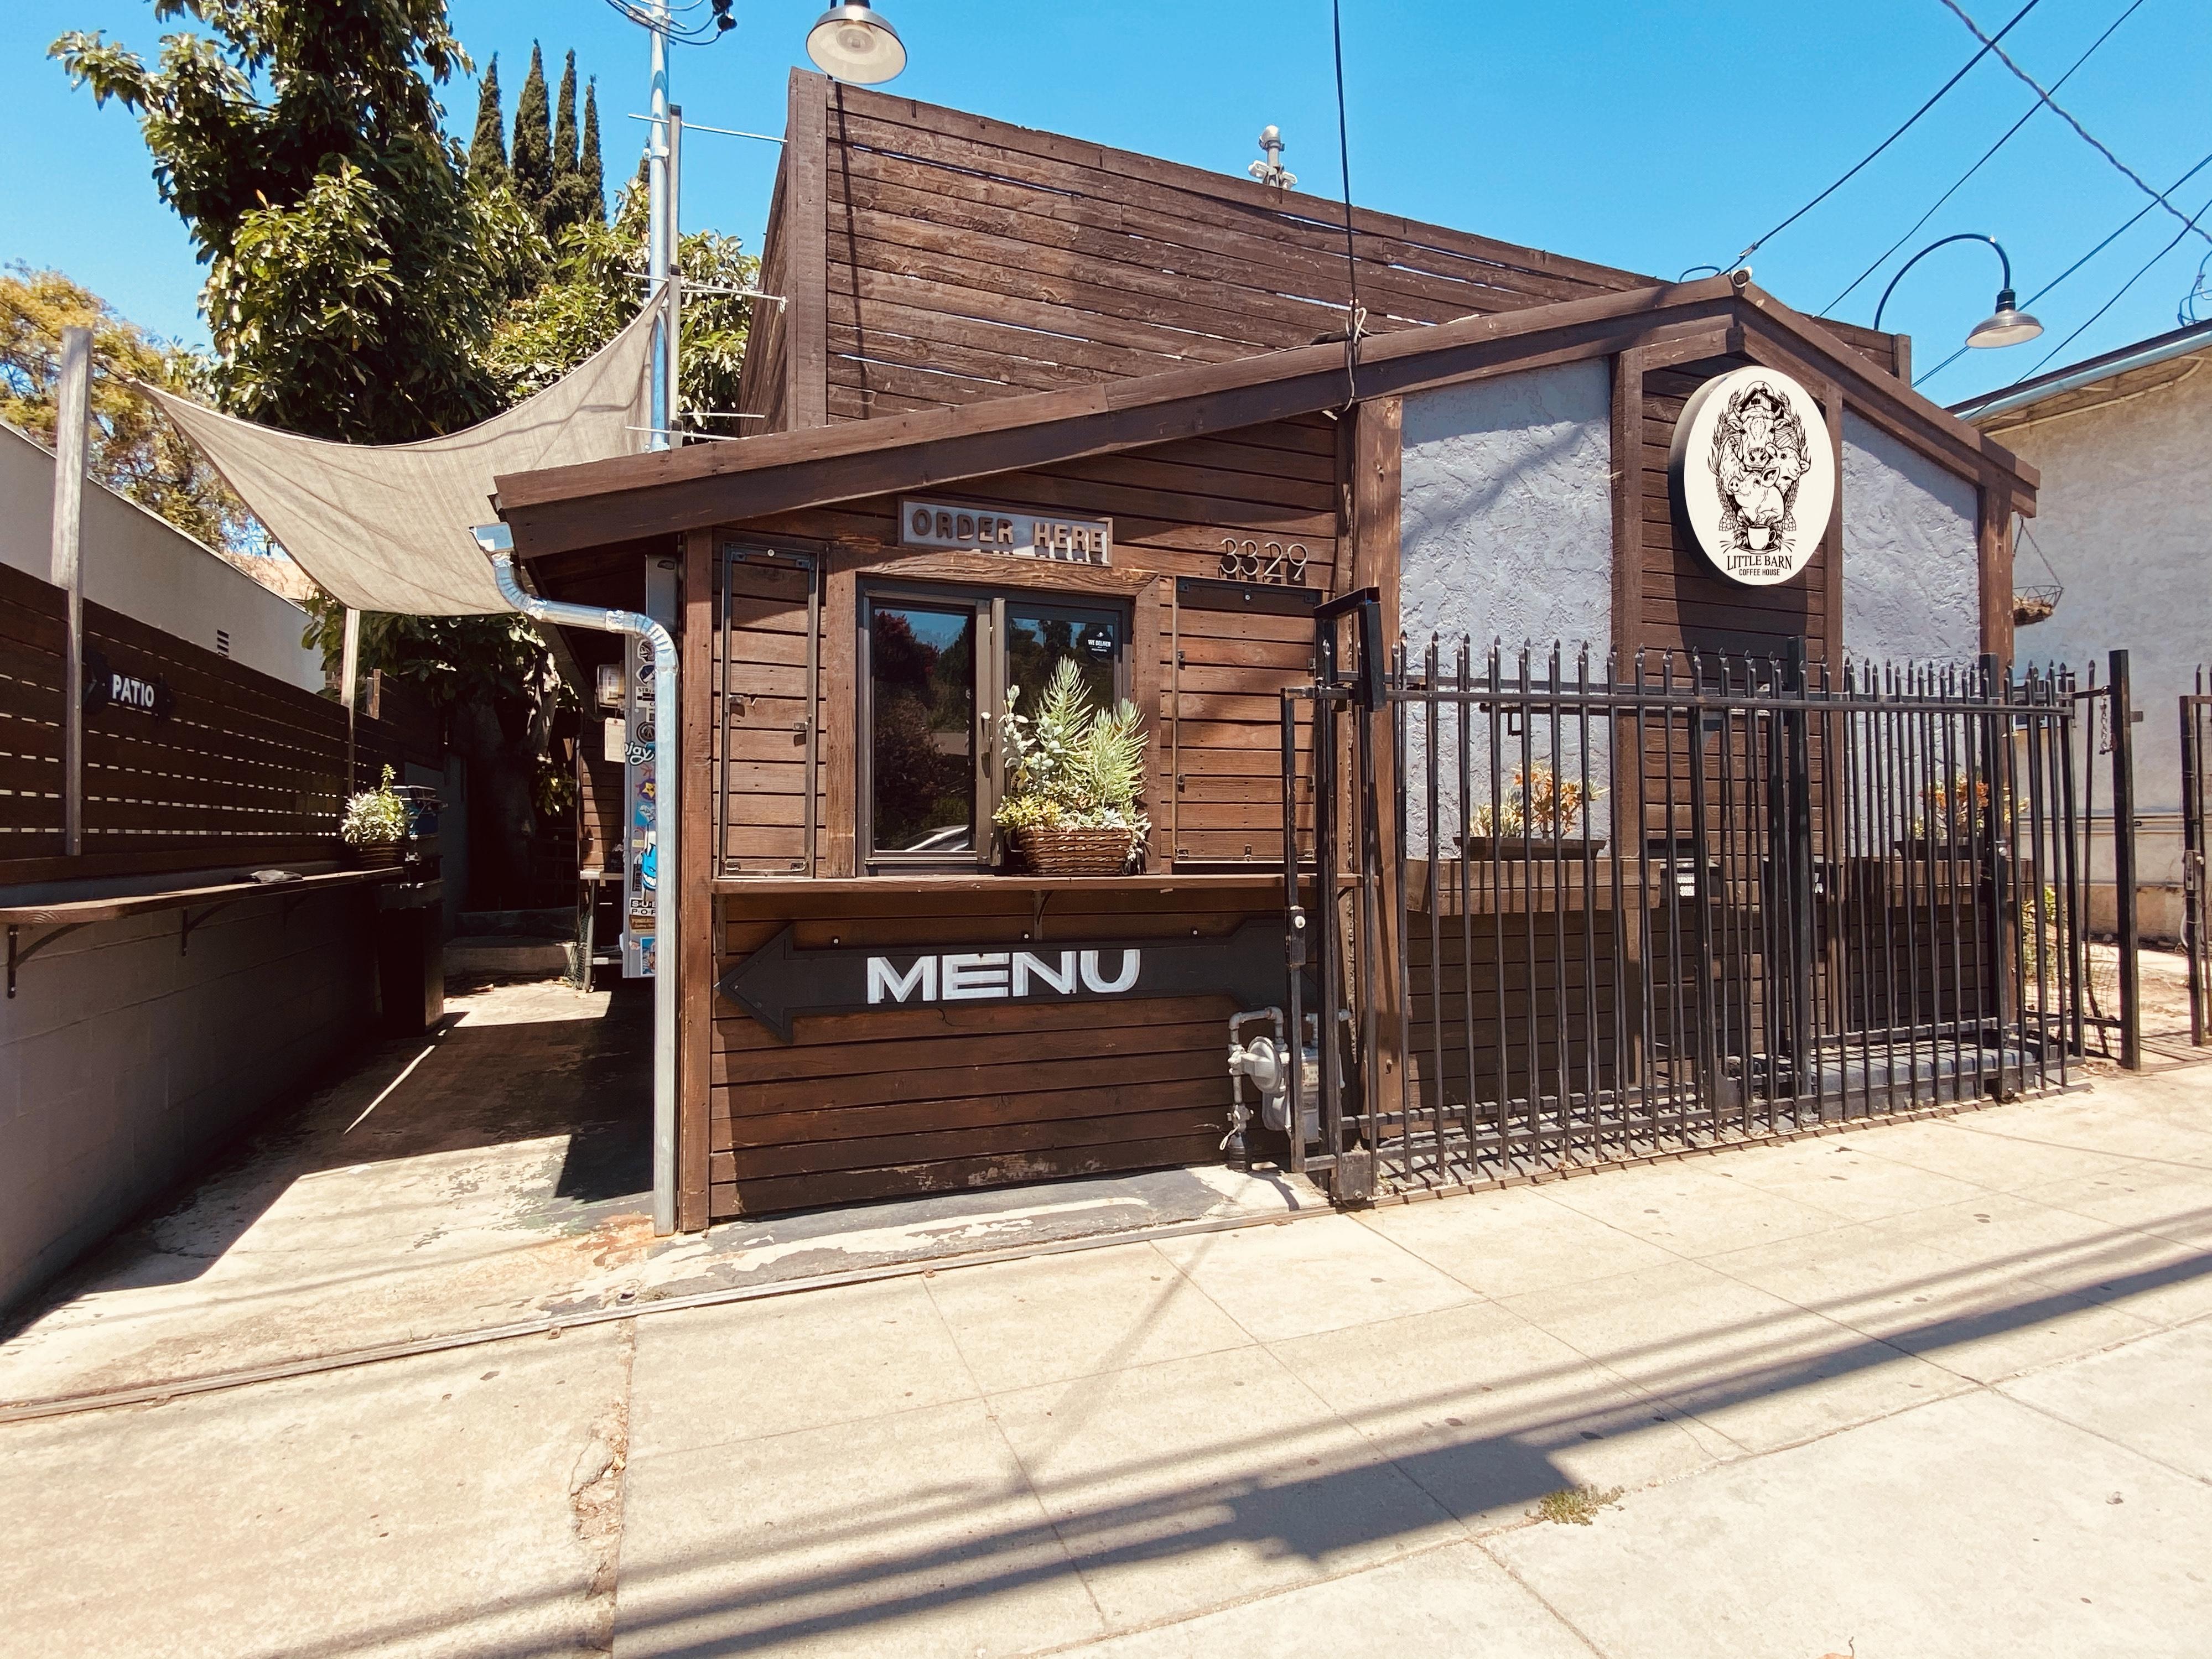 Little Barn Coffee in Glassell Park, California